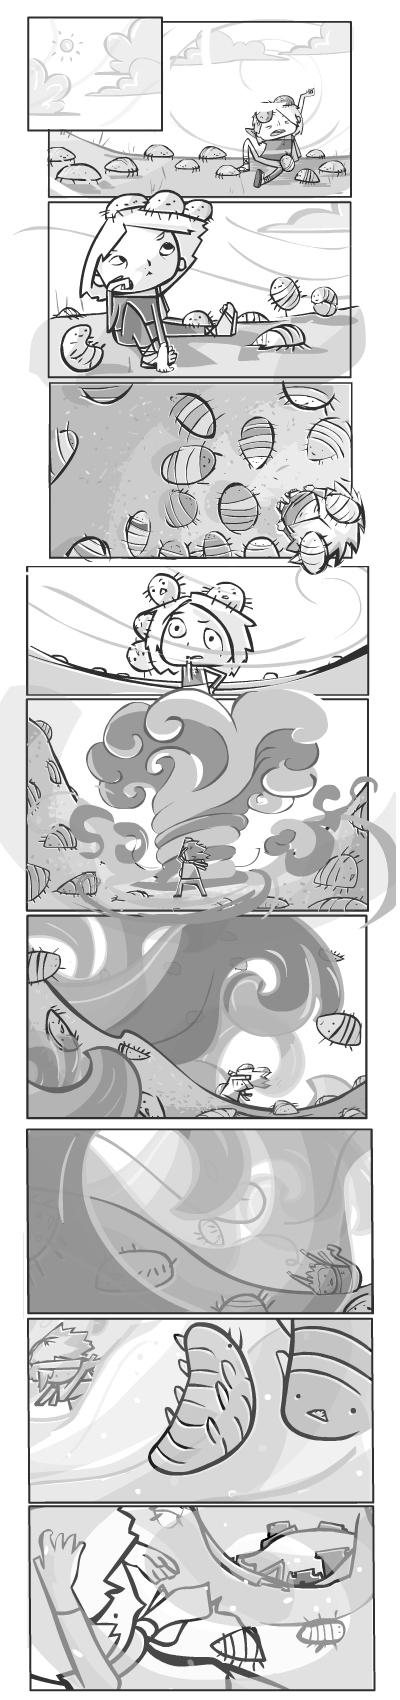 we are friend : mini comic 2 by RayArray